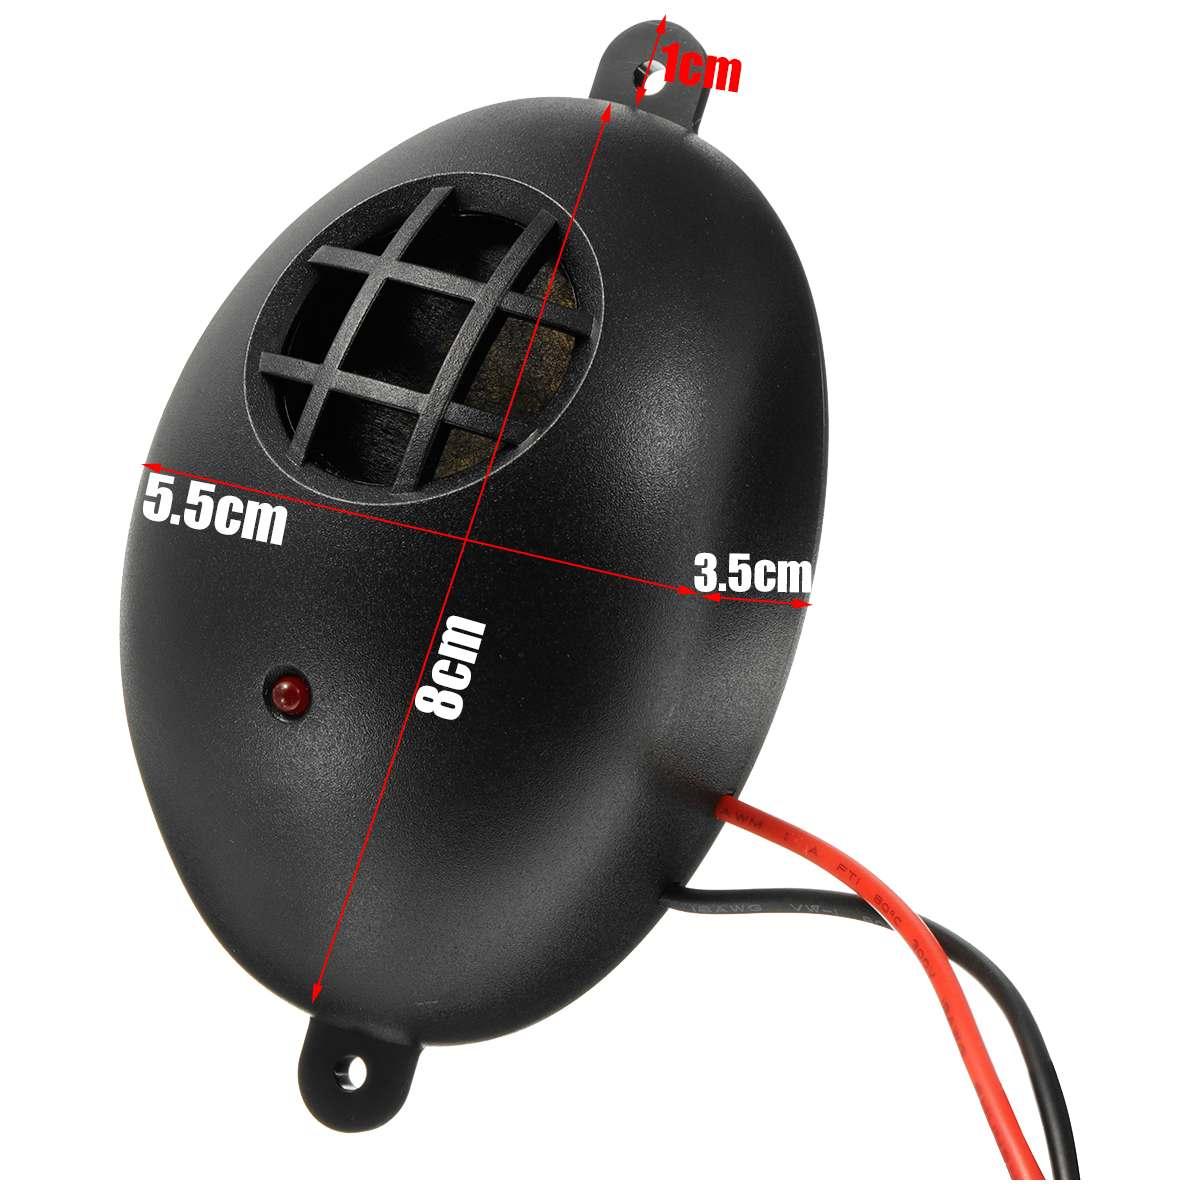 Car Vehicle Ultrasonic Mouse Repeller 12V DC 20-70KHZ Ultrasound Pest Controller Deterrent Tool Semicircular Easy To Install